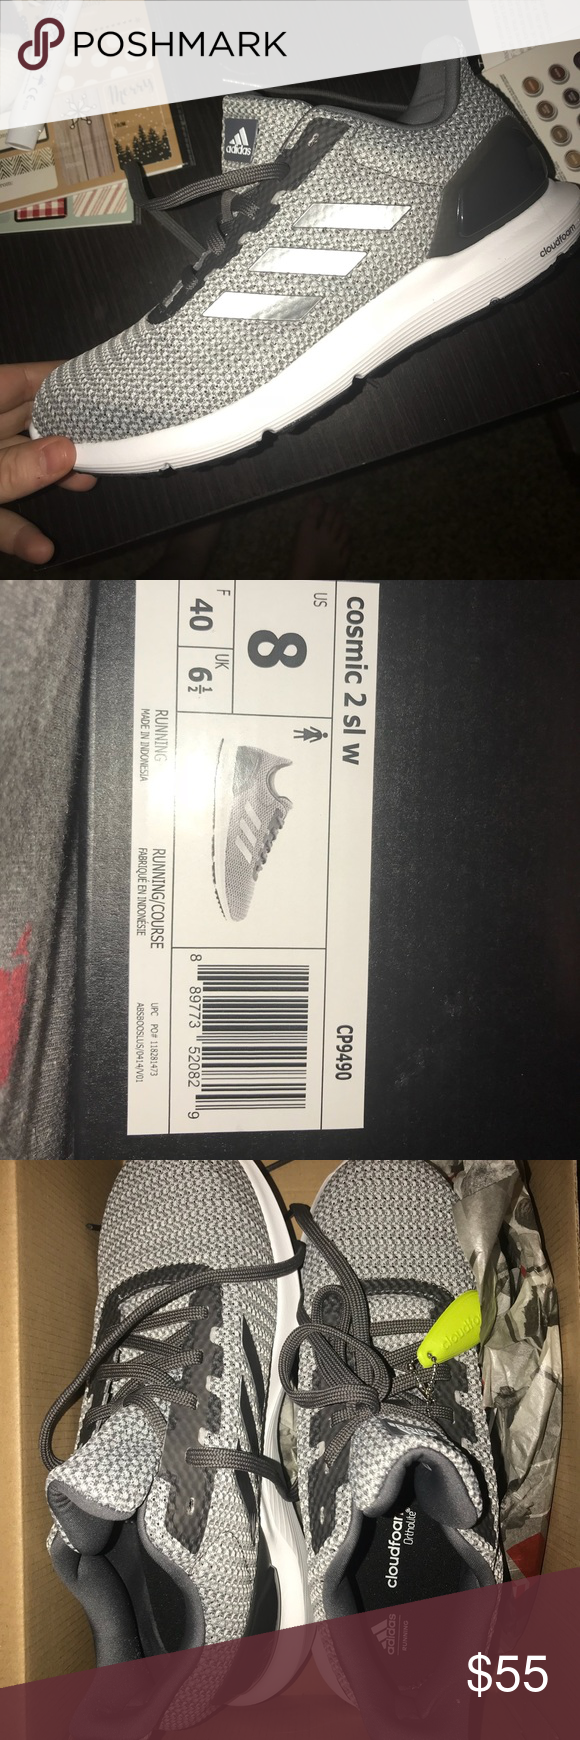 adidas originaux par alexander wang saison 2 lookbook est fou